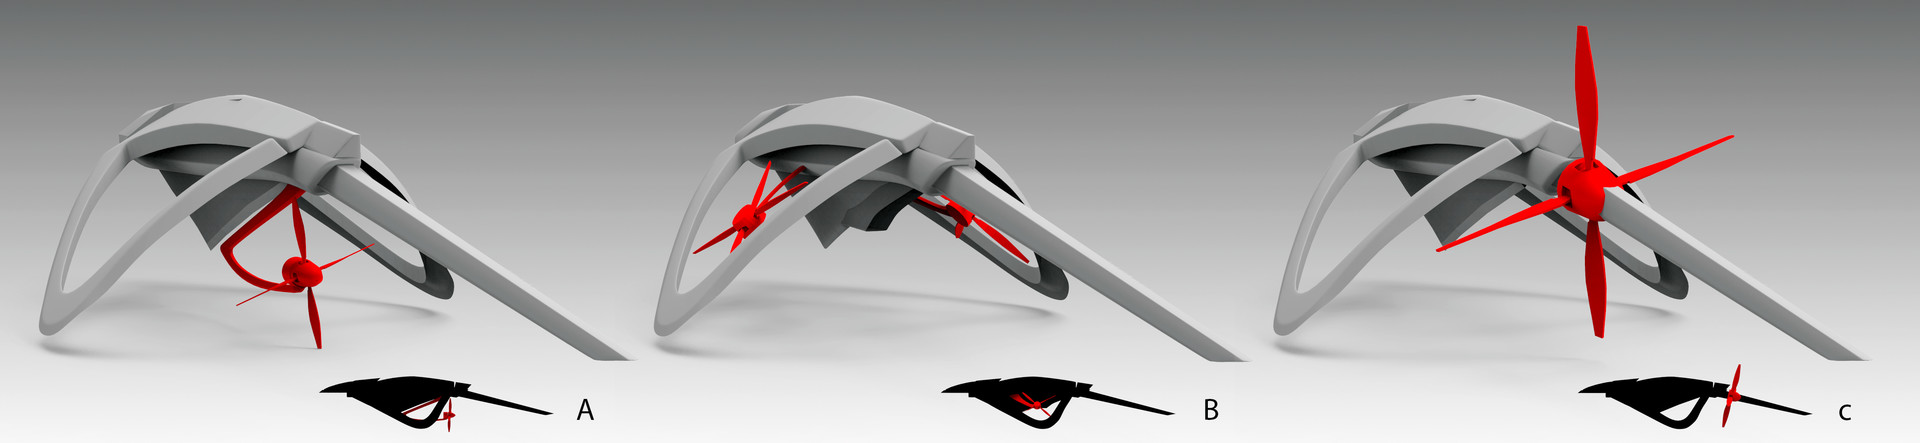 Raul eduardo sanchez osorio nave asia rotor concepts 001